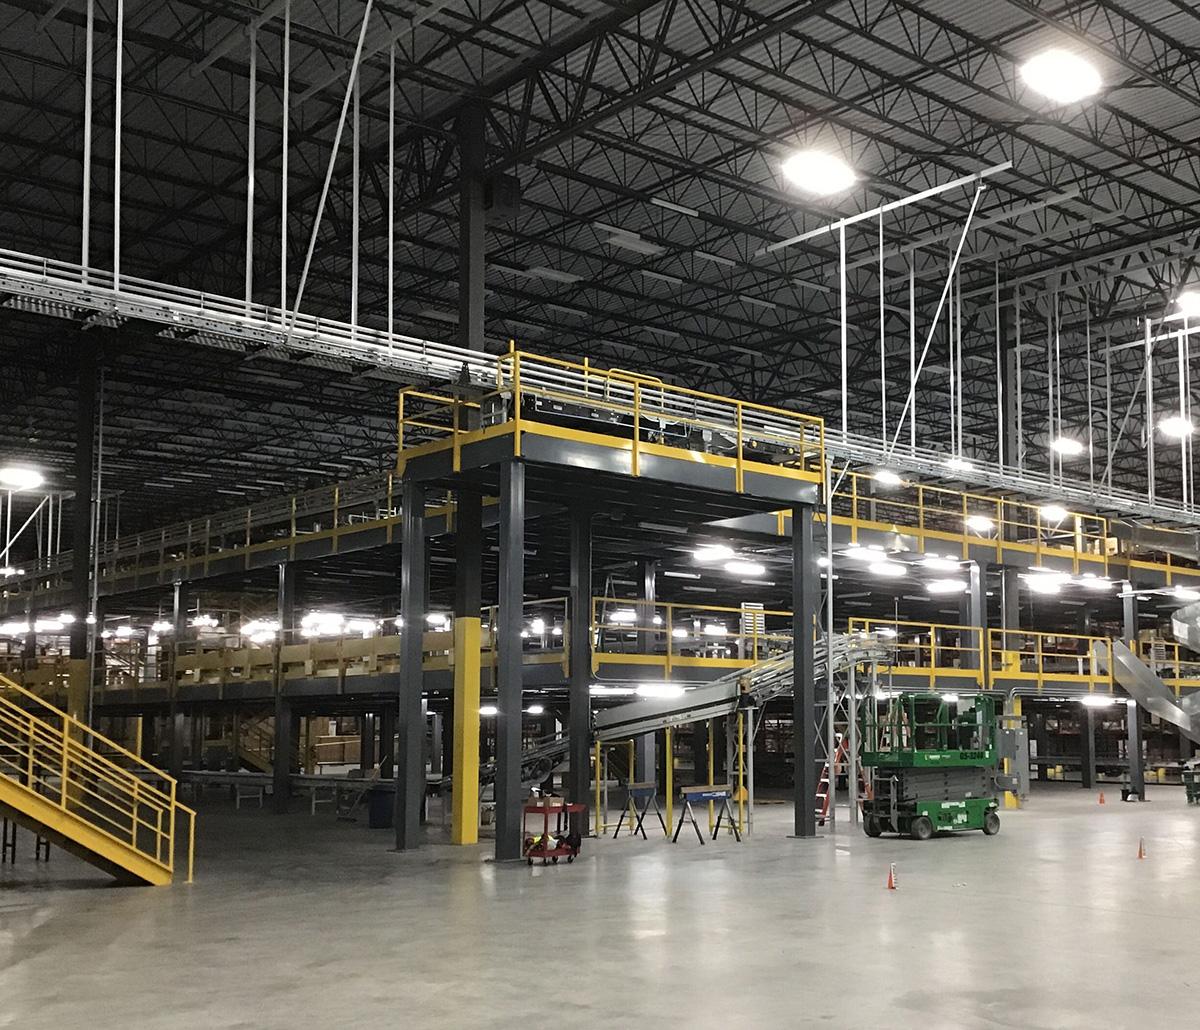 MiTek Mezzanine Systems Engineered Systems Products - Mezzanine inside a warehouse